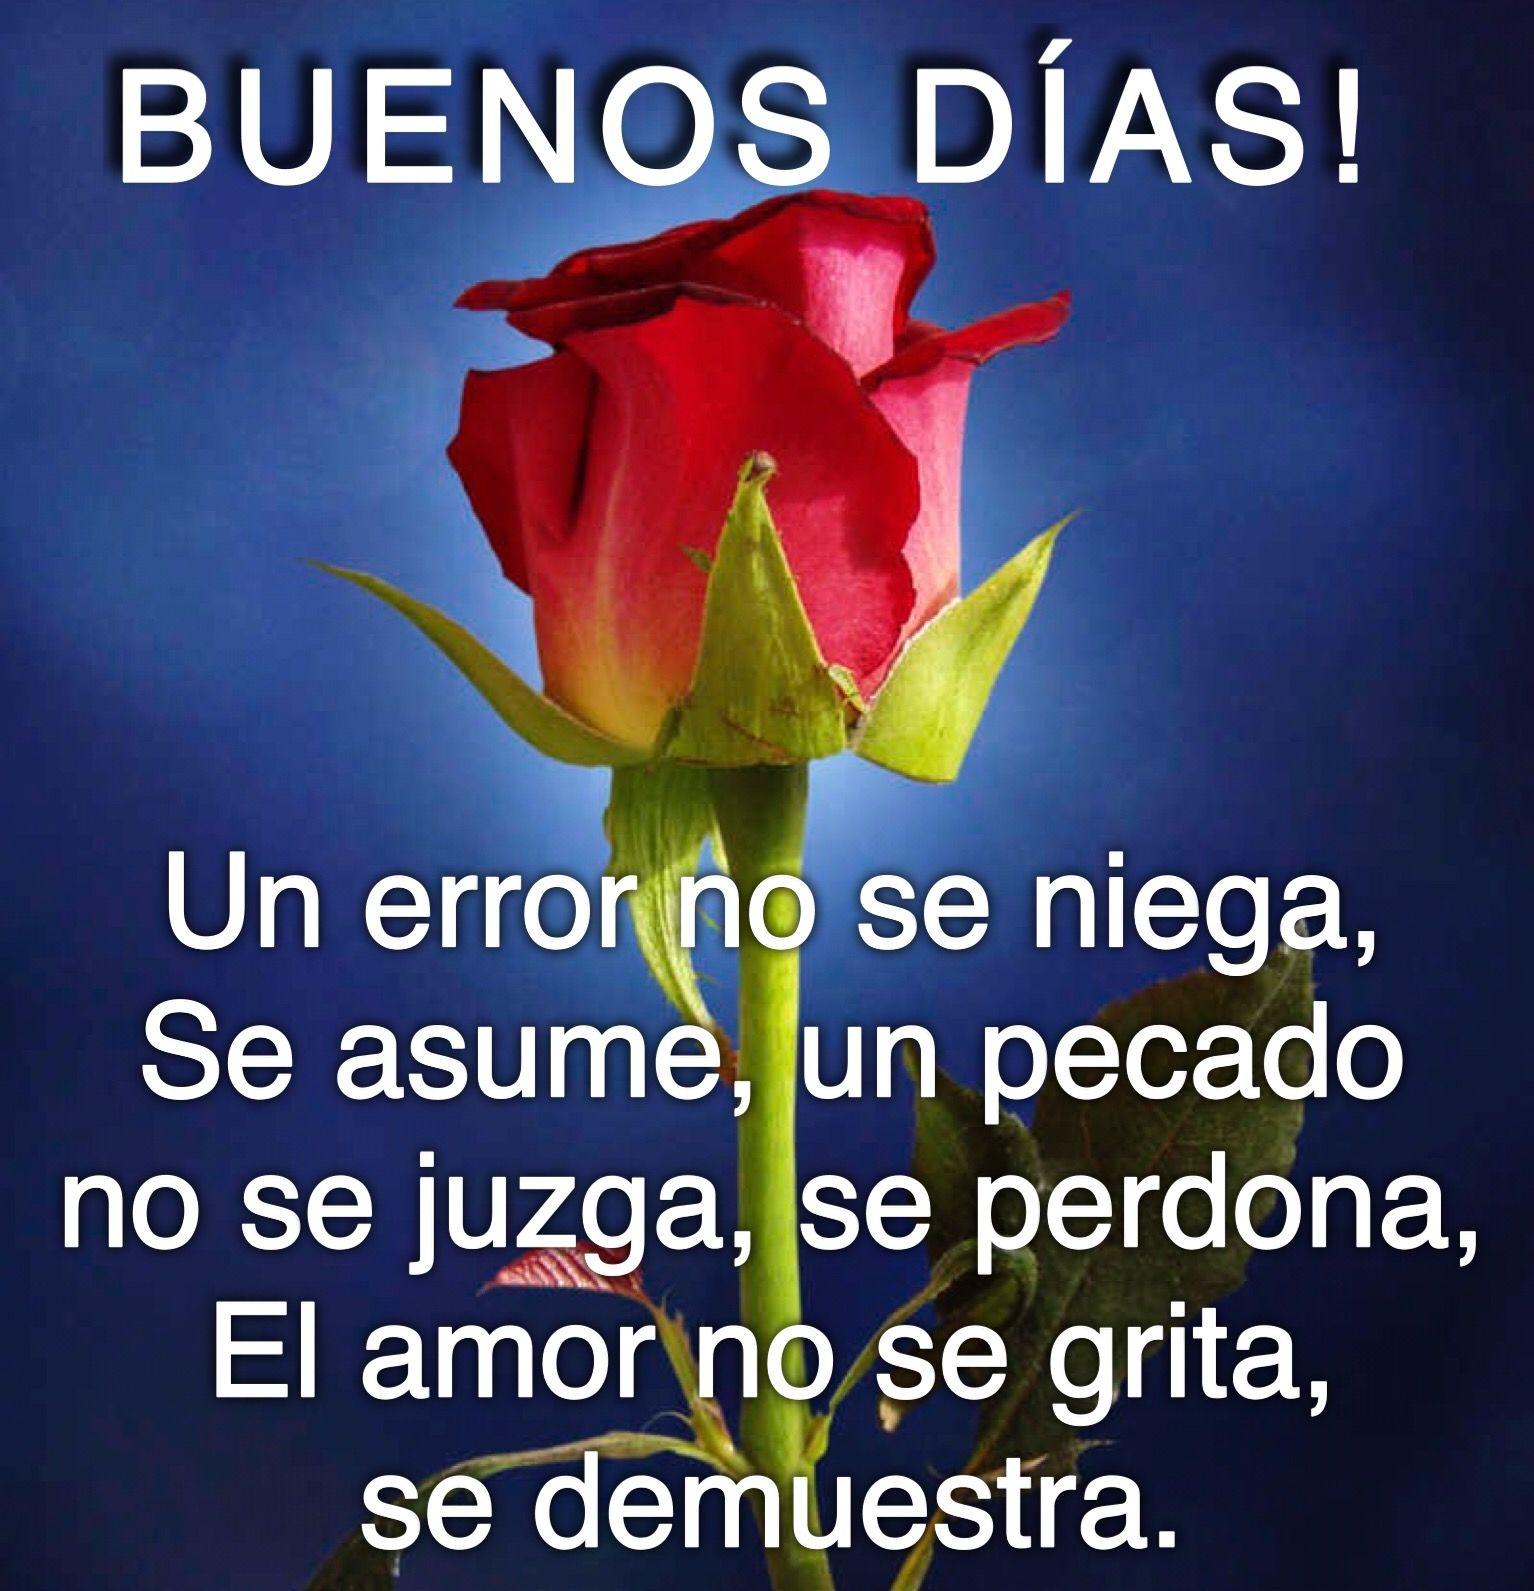 Buen Dia Frase Bonitas Frases De Amor Mensaje De Buenos Das Buenas Noches Telar Aves Cielo Mensajes